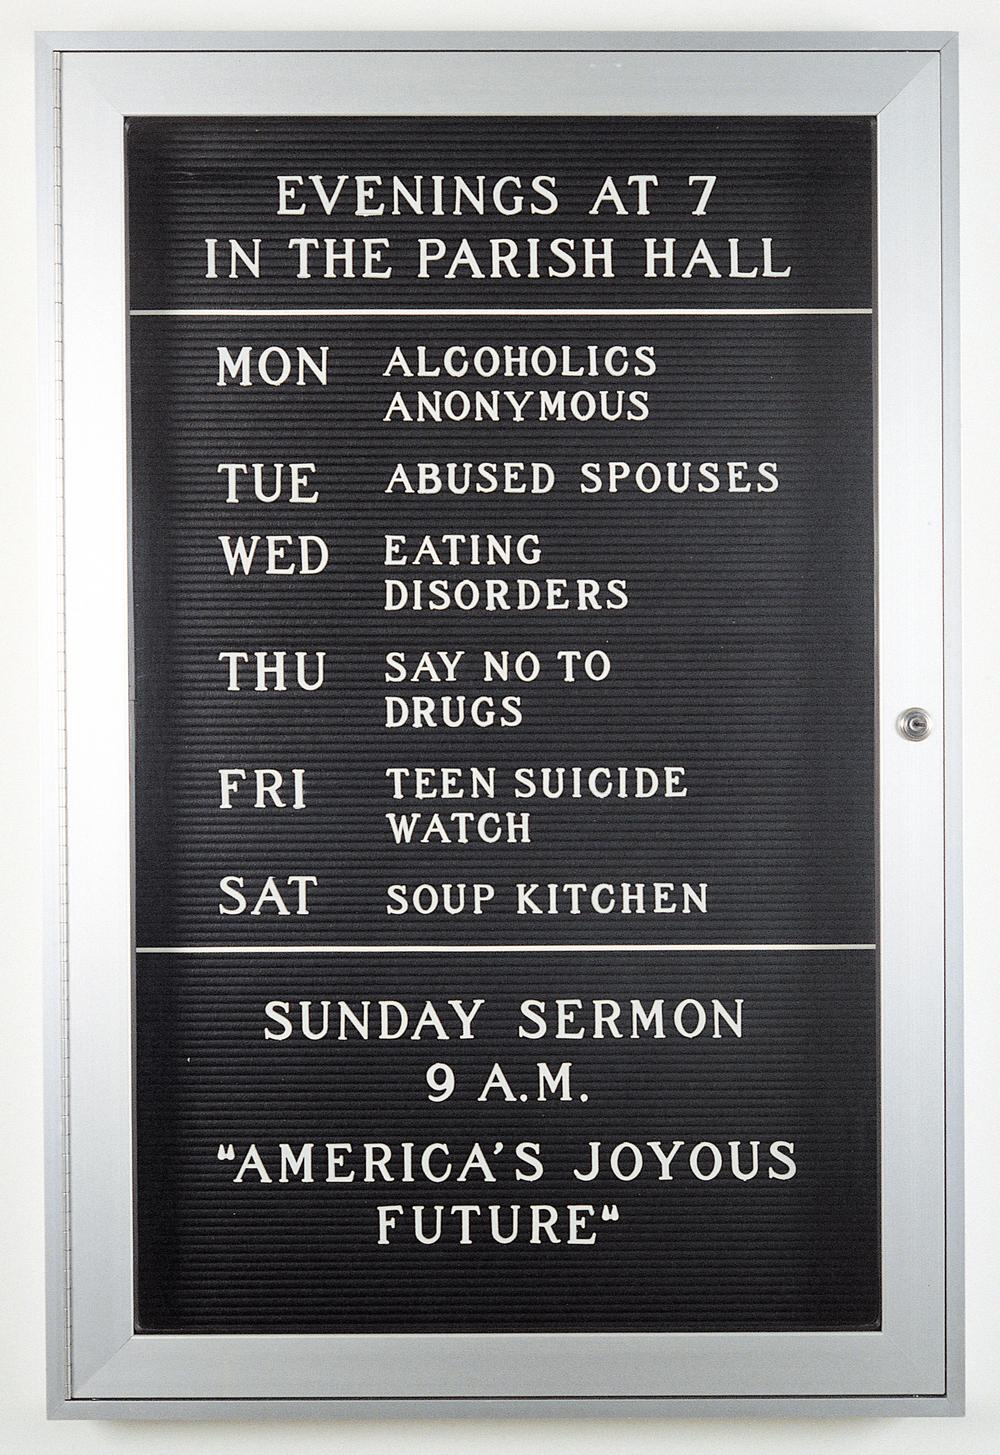 America's Joyous Future, 1991